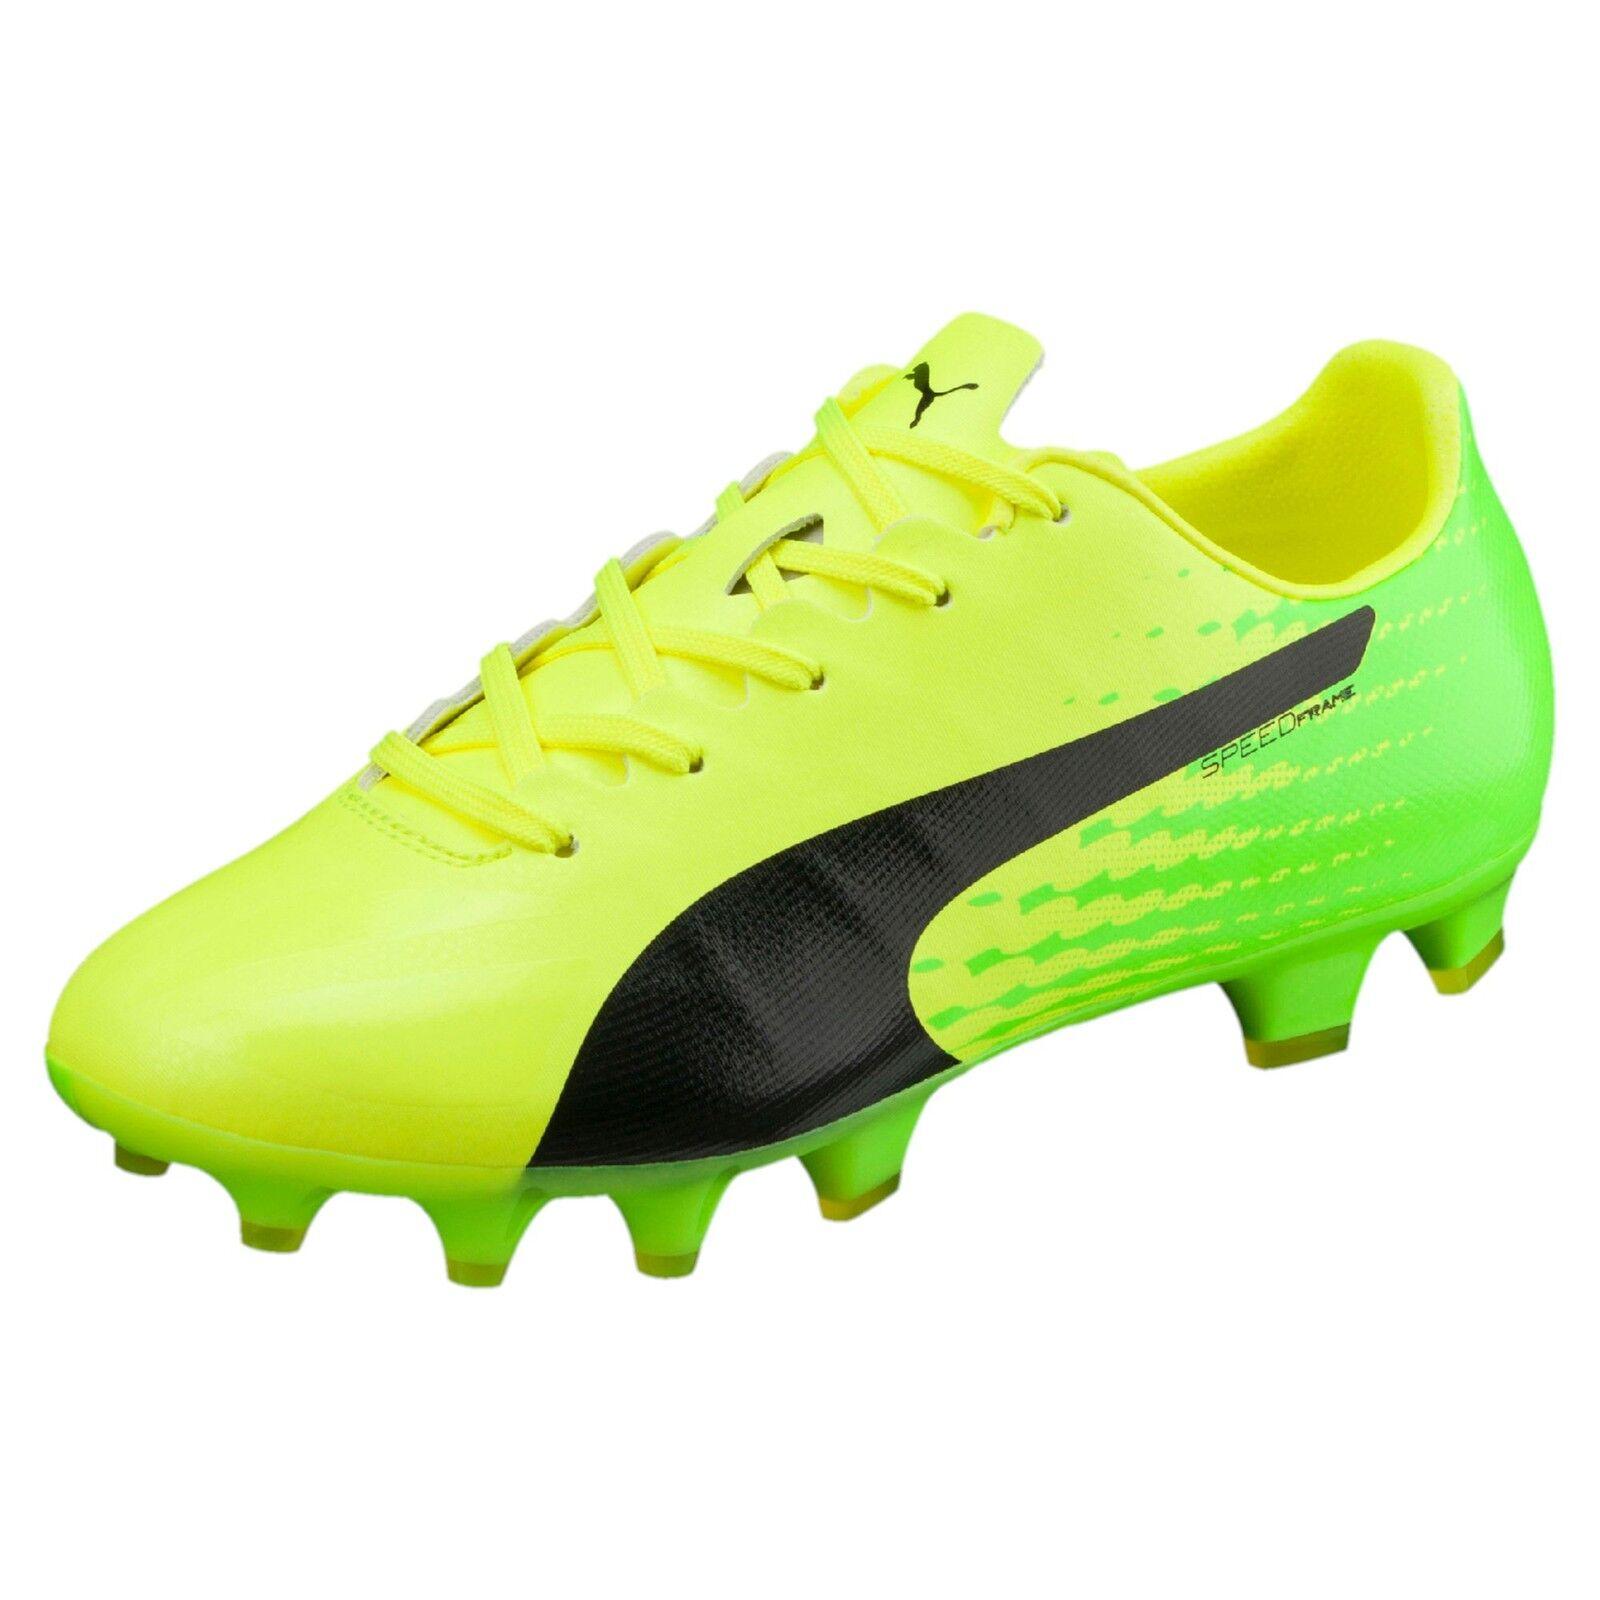 PUMA evoSPEED 17 SL-S FG Kinder Fußballschuhe Fußball Schuhe Unisex Neu